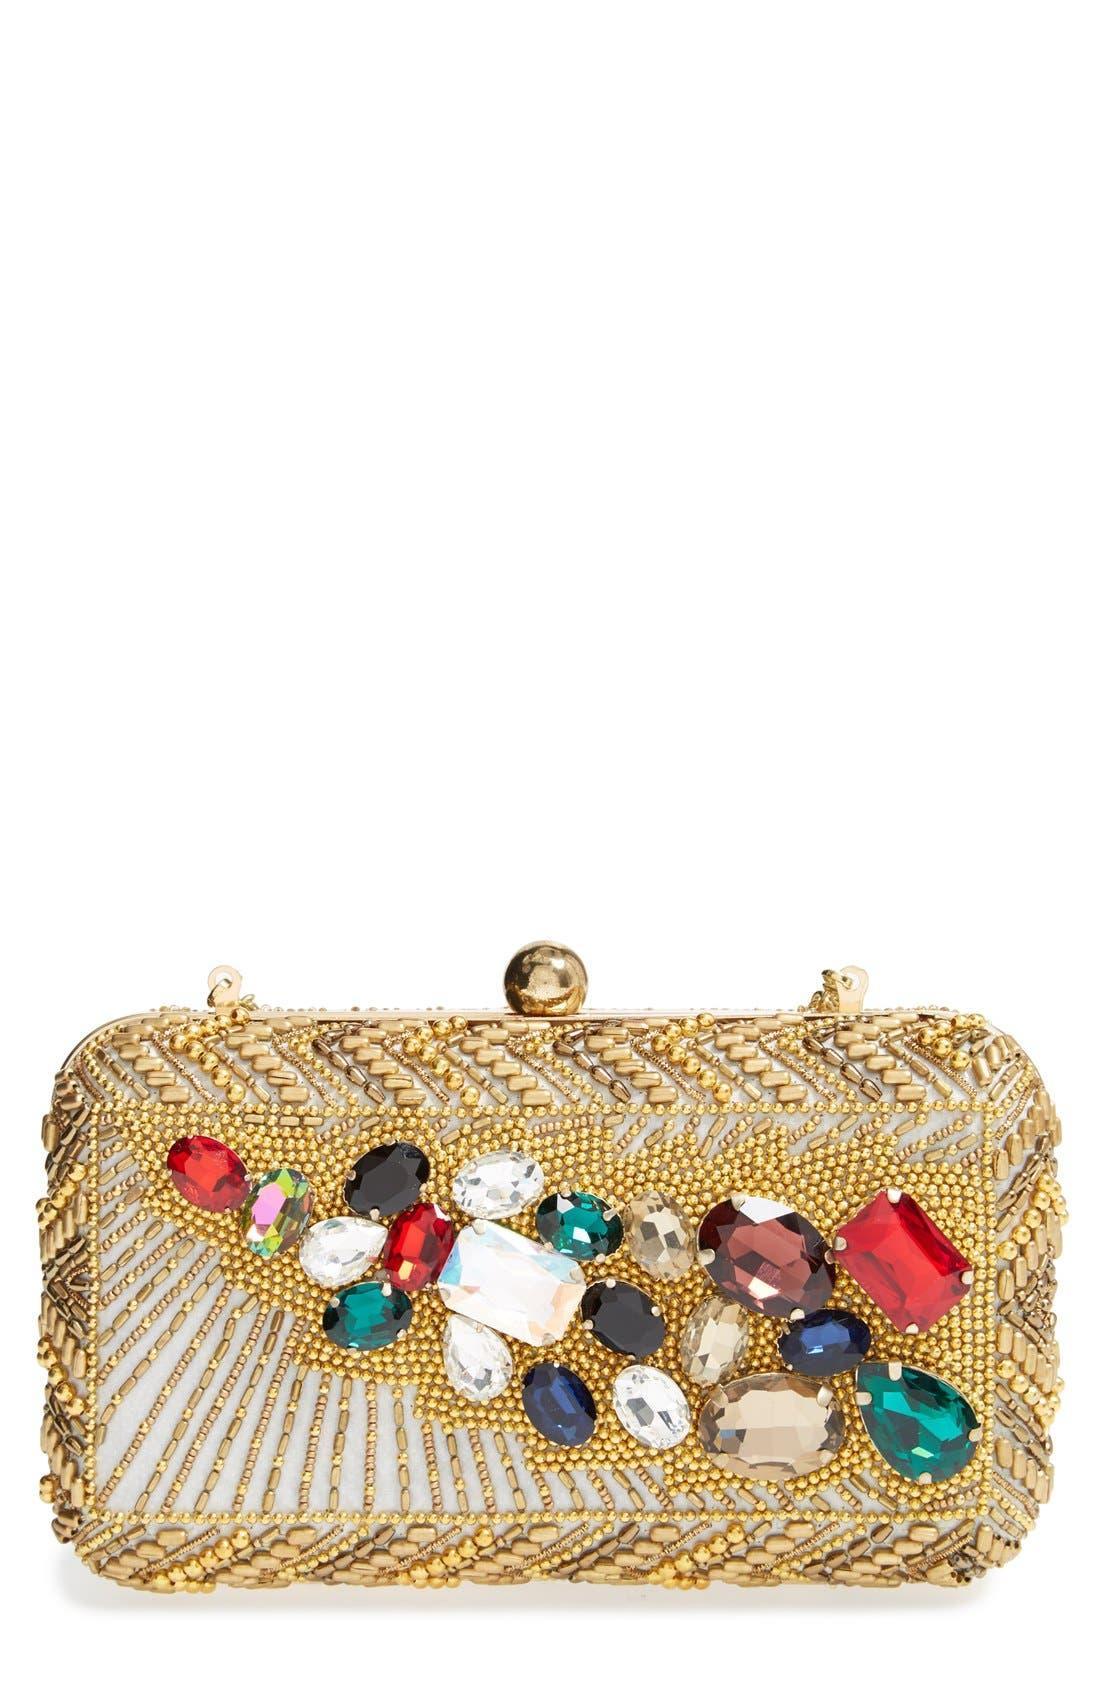 Main Image - Natasha Couture 'Left Bank' Embellished Box Clutch